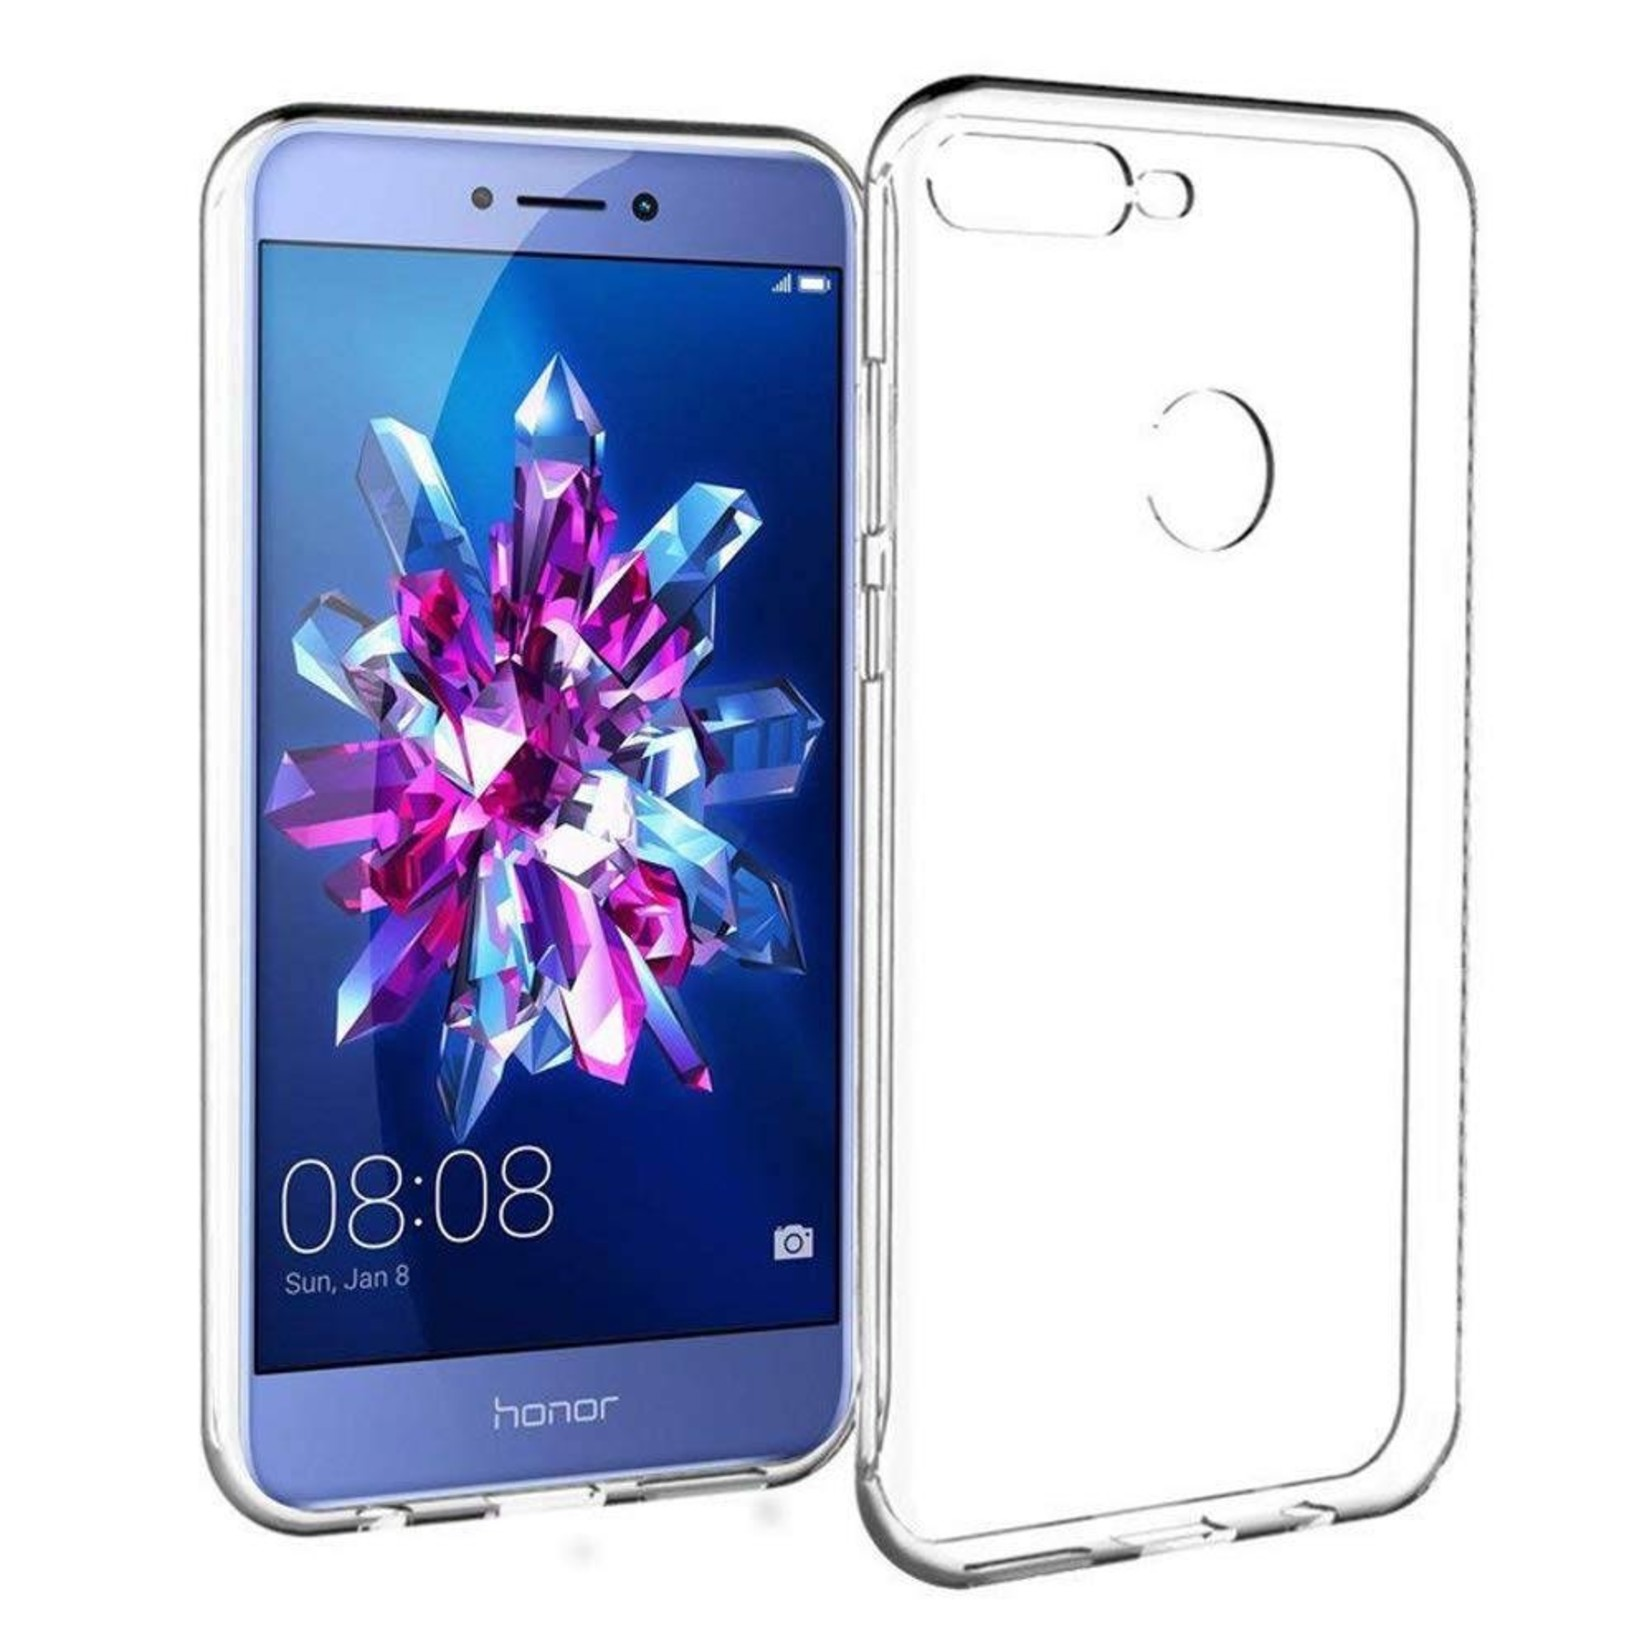 Colorfone Hoesje CoolSkin3T voor Huawei Honor 7C Tr. Wit